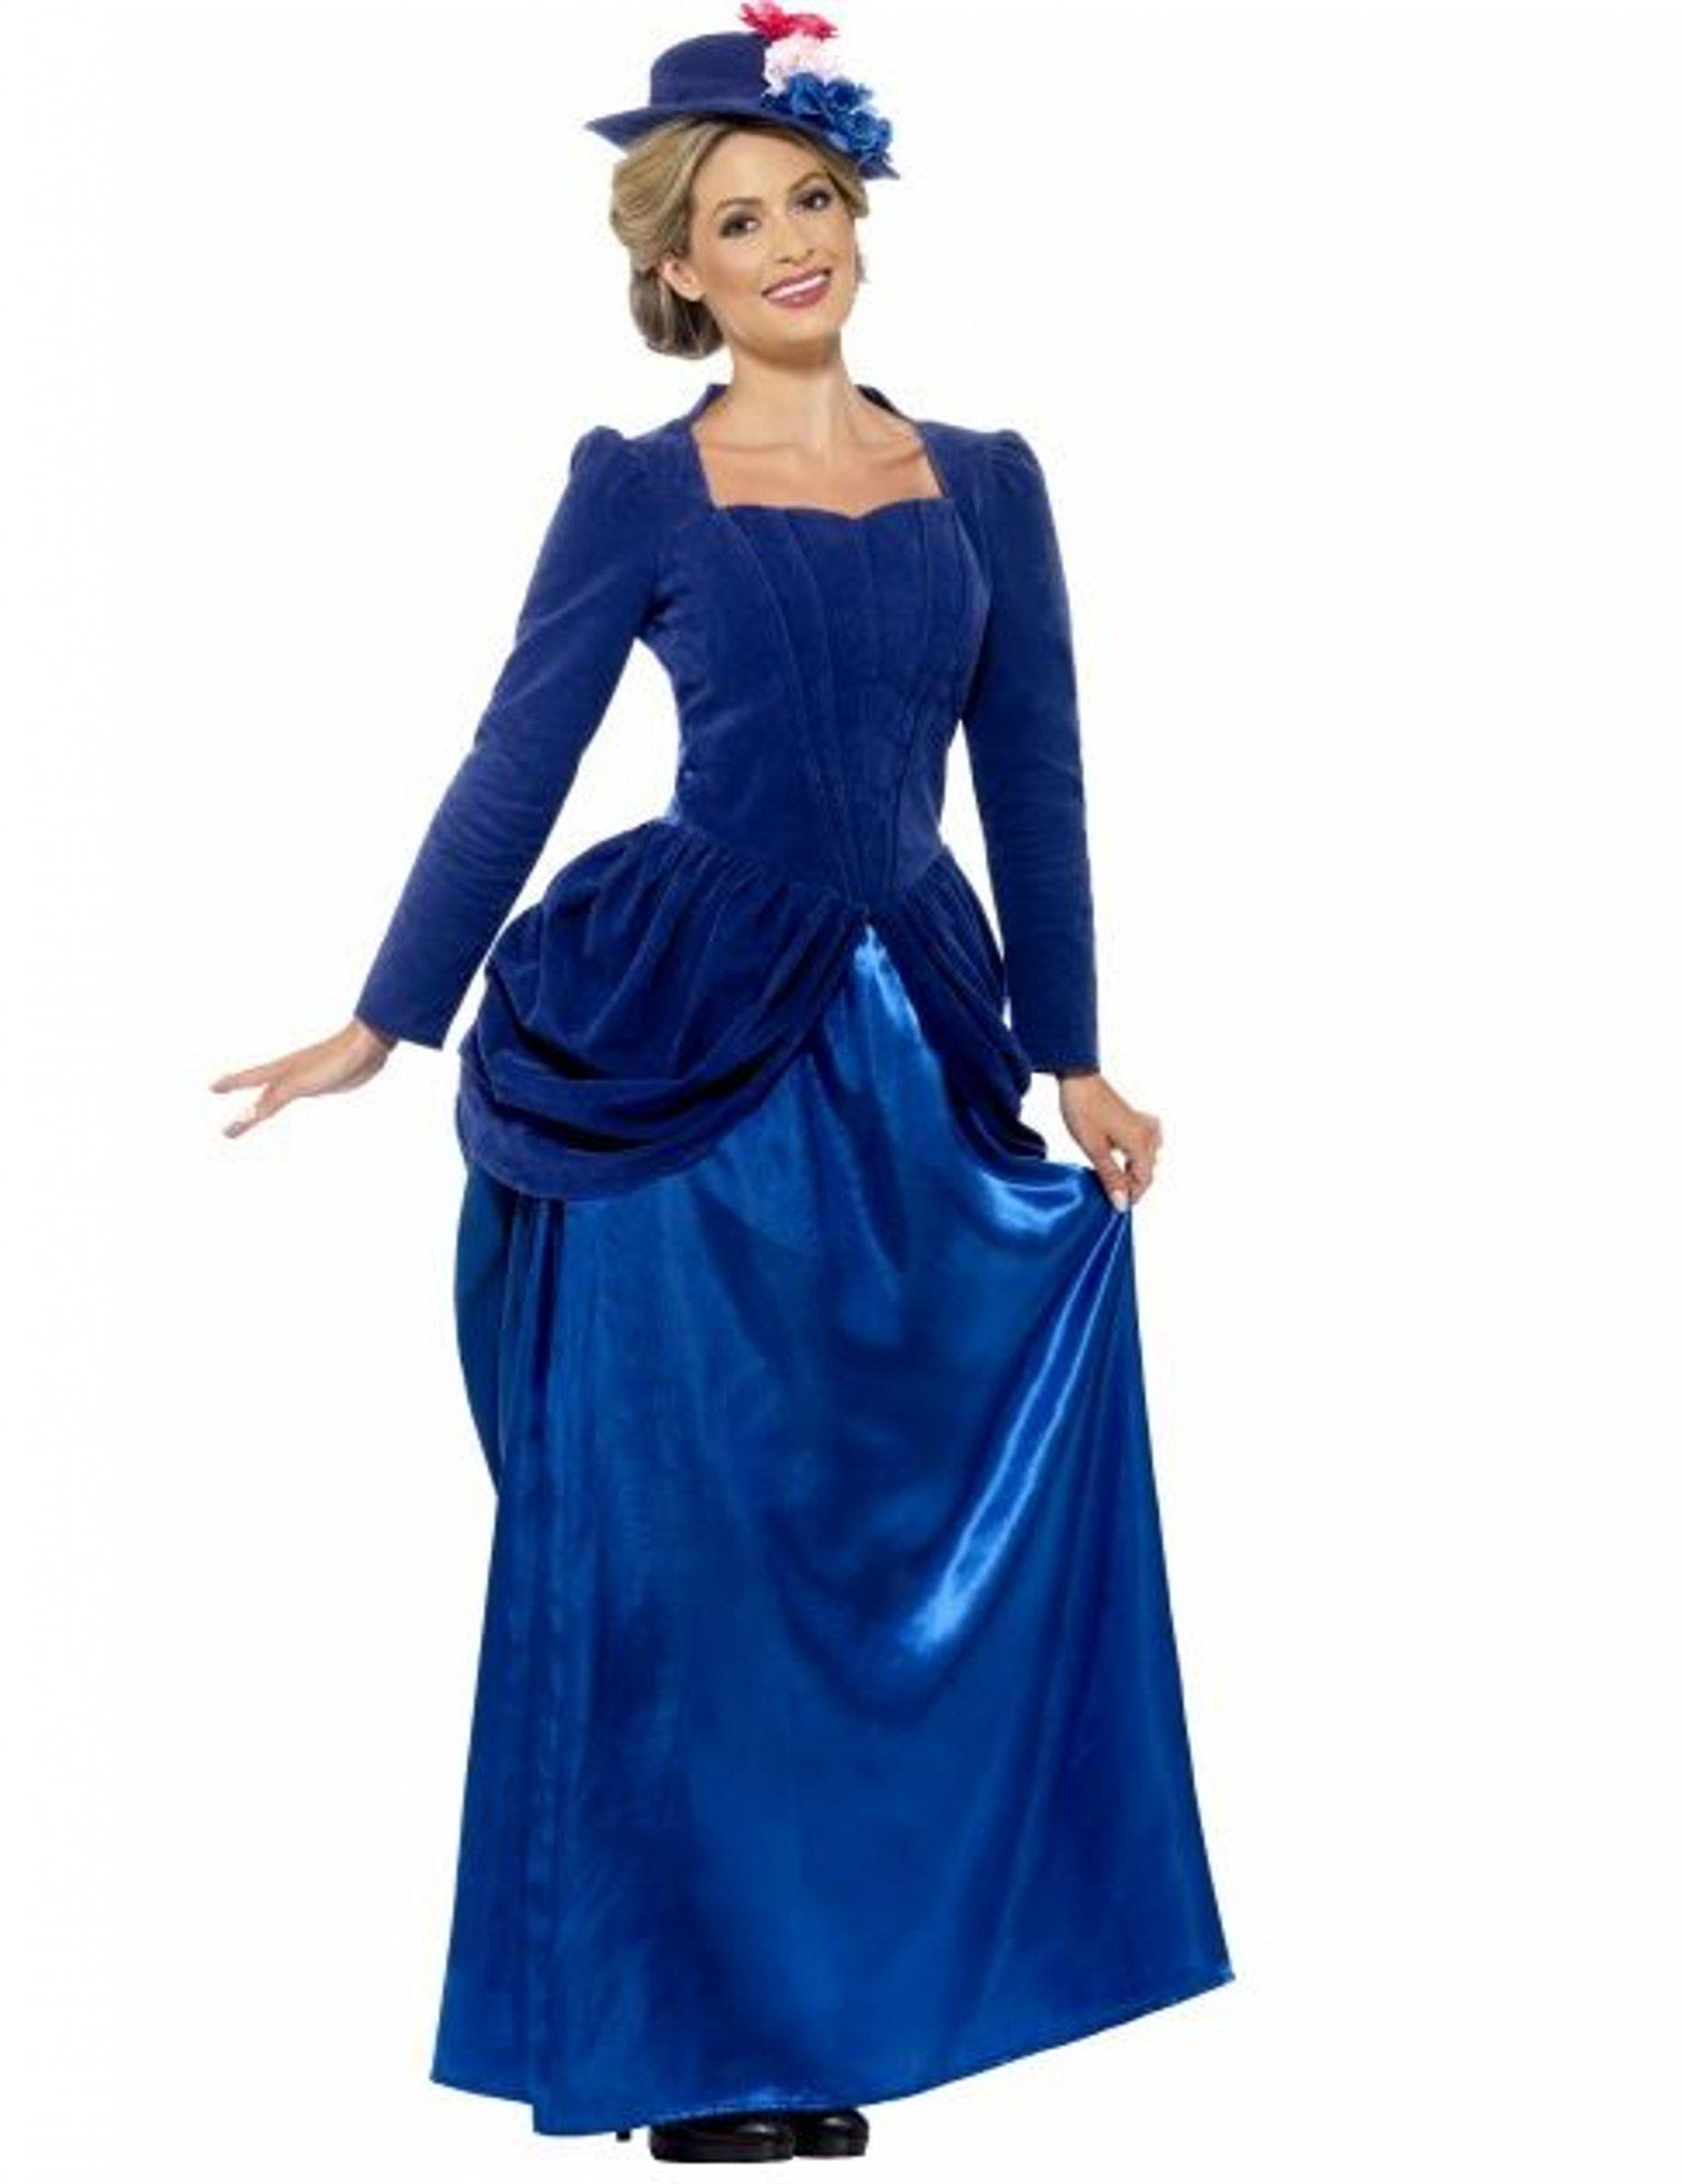 viktorianische prinzessin damen kost m blau kost me f r. Black Bedroom Furniture Sets. Home Design Ideas